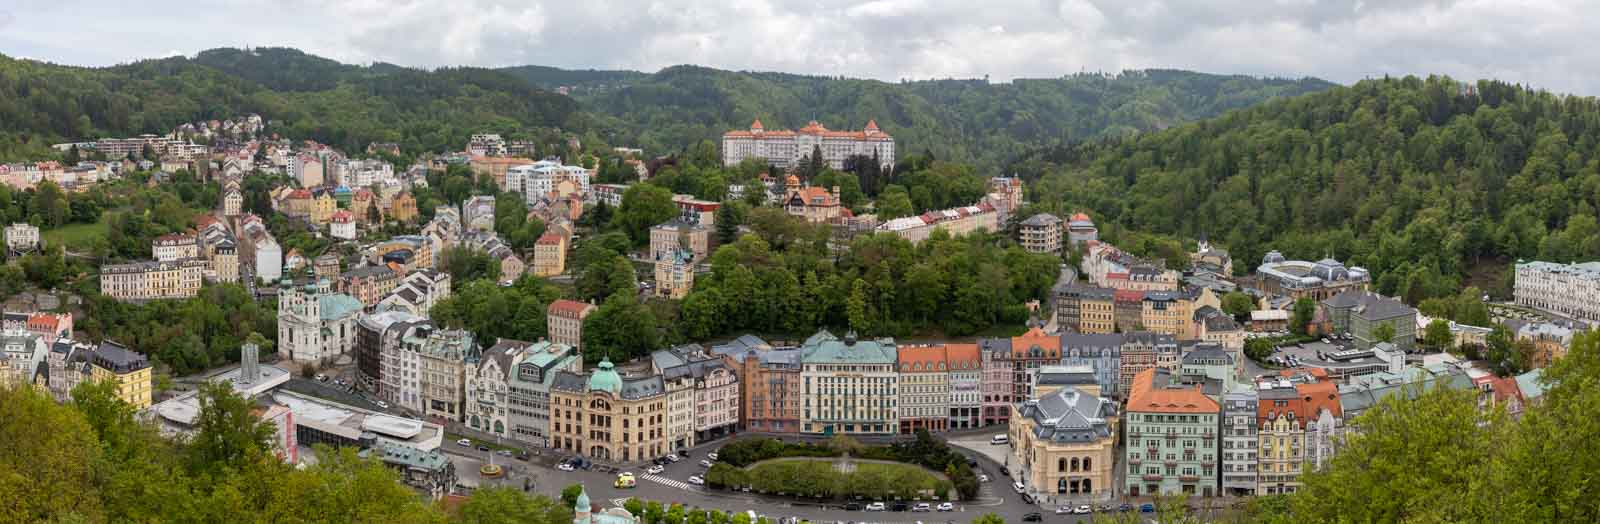 Czechia, Karlovy Vary, Karlsbad, Tschechien, Urlaub, Vaccation